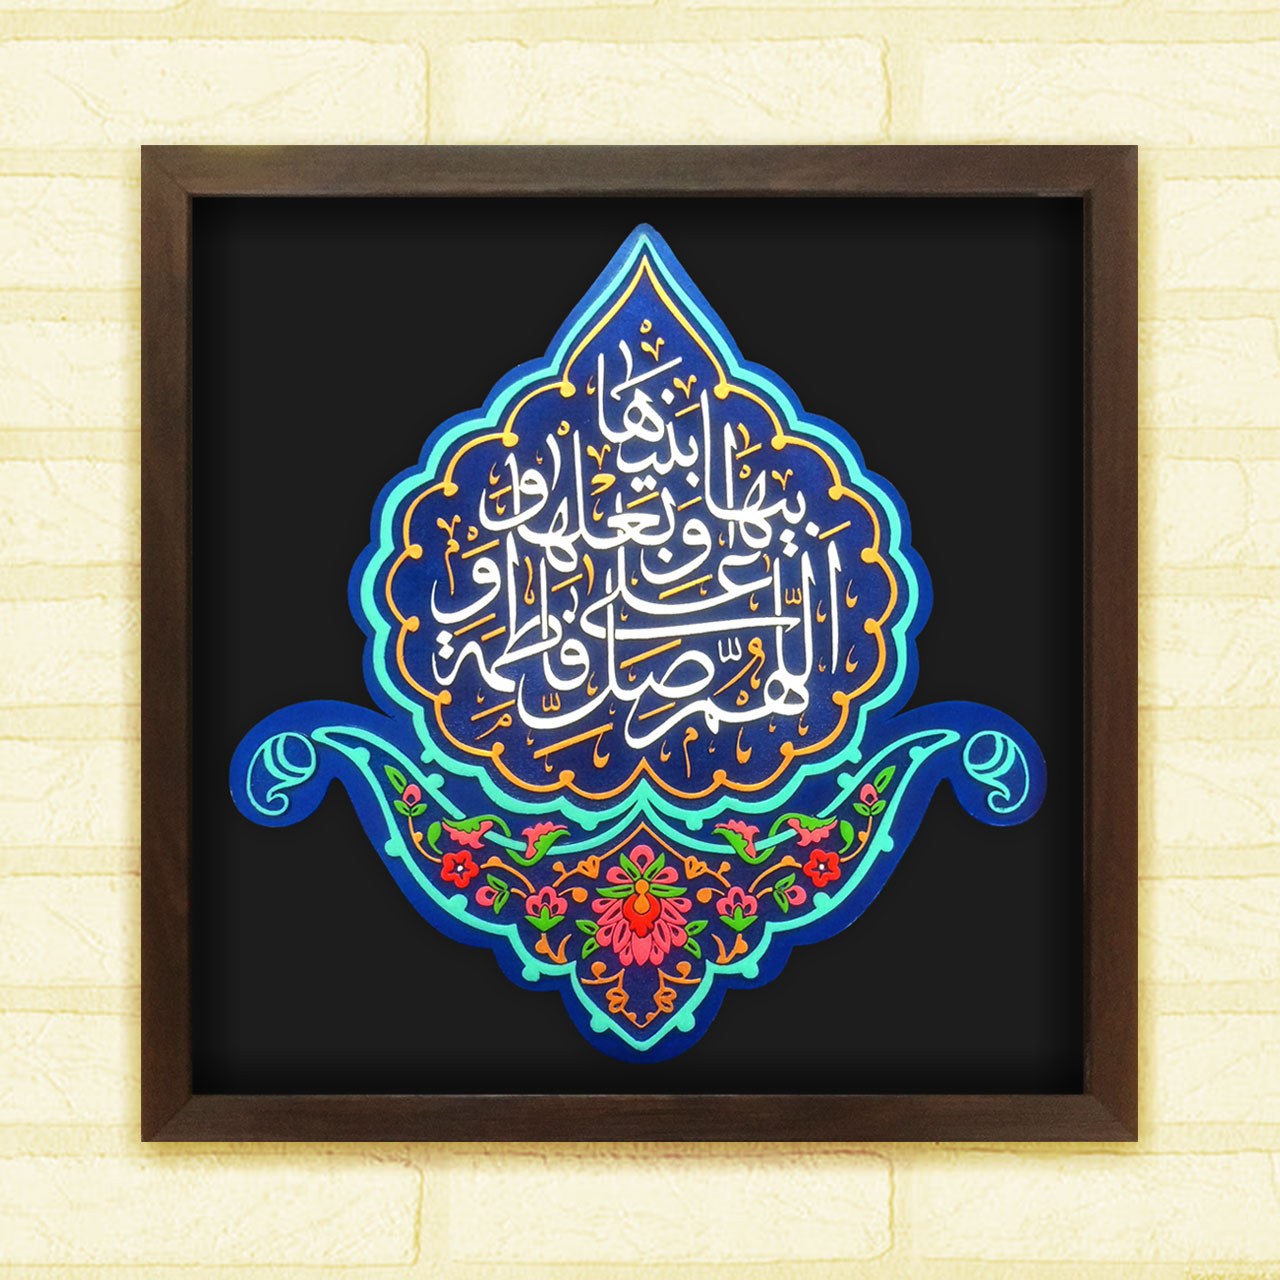 خرید                      تابلو برجسته لوح هنر طرح صلوات حضرت فاطمه س کد 162